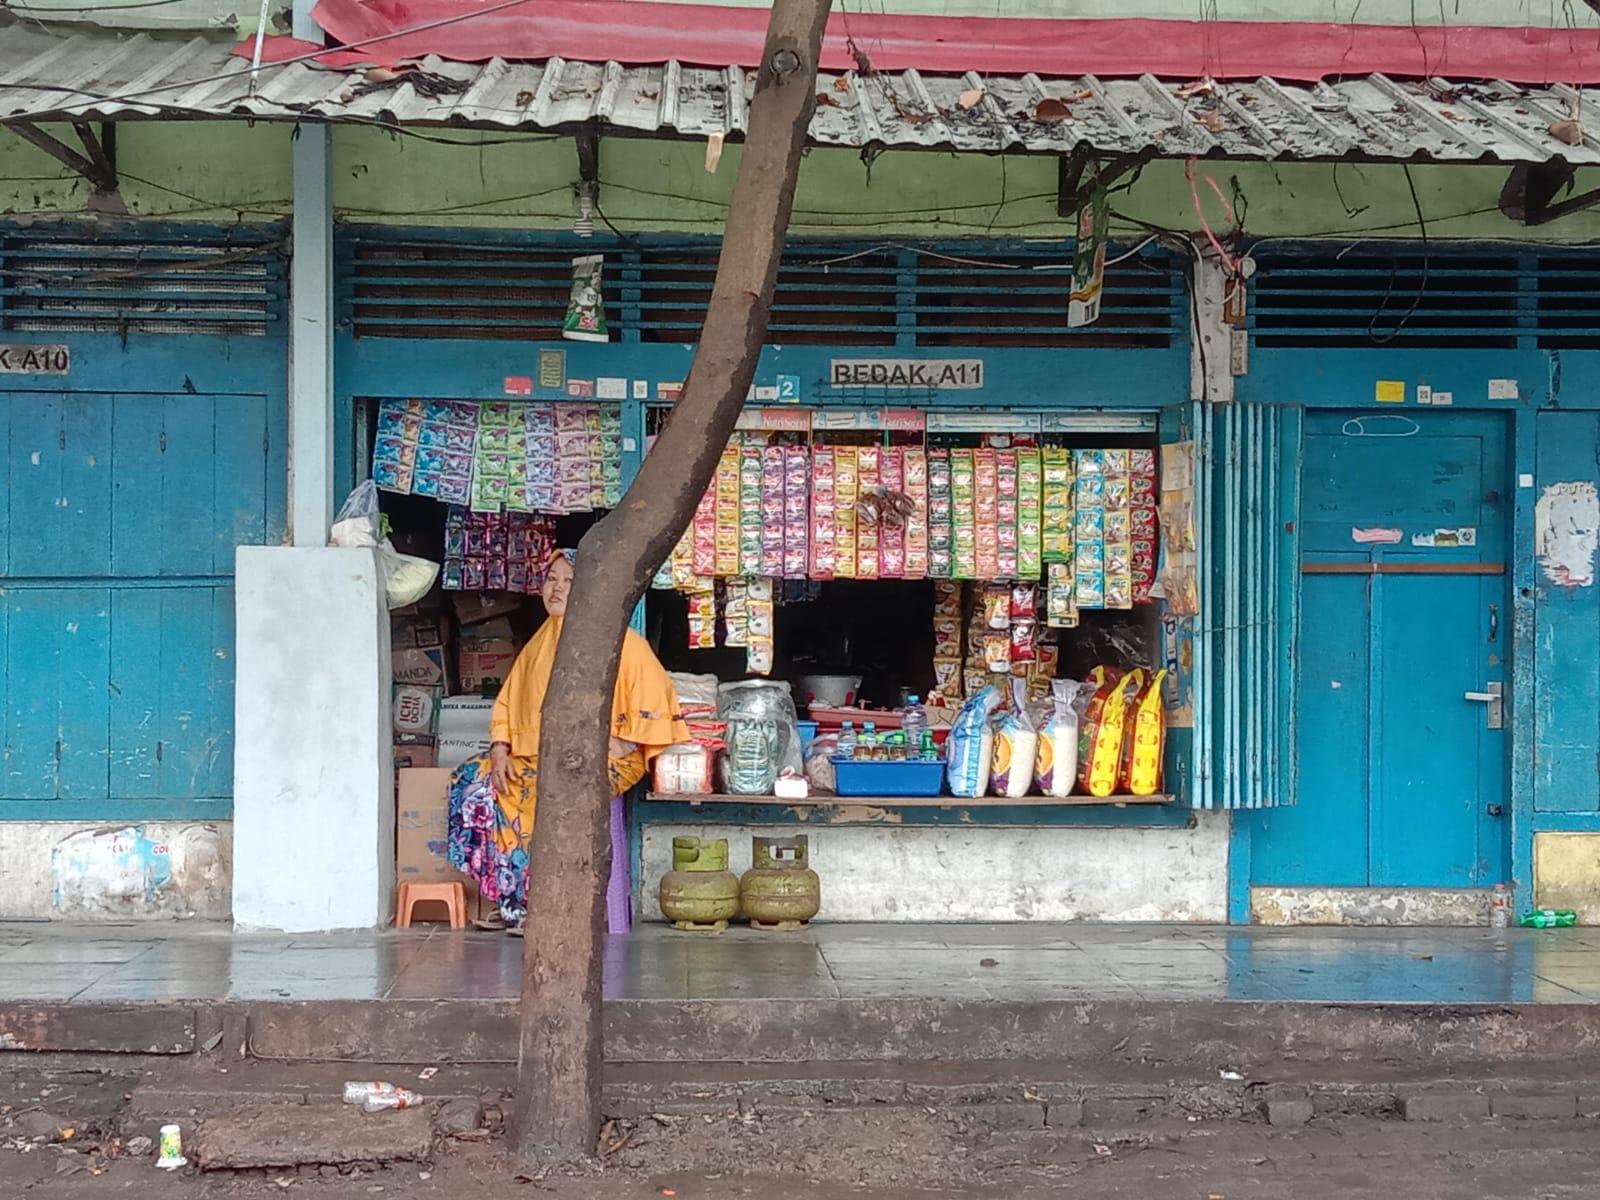 Salah satu warung di Kota Malang. Inflasi Kota Malang tahun 2020 sendiri hanya sebesar 1,42 persen. (Foto: Fen/Tugu Malang/Tugu Jatim)